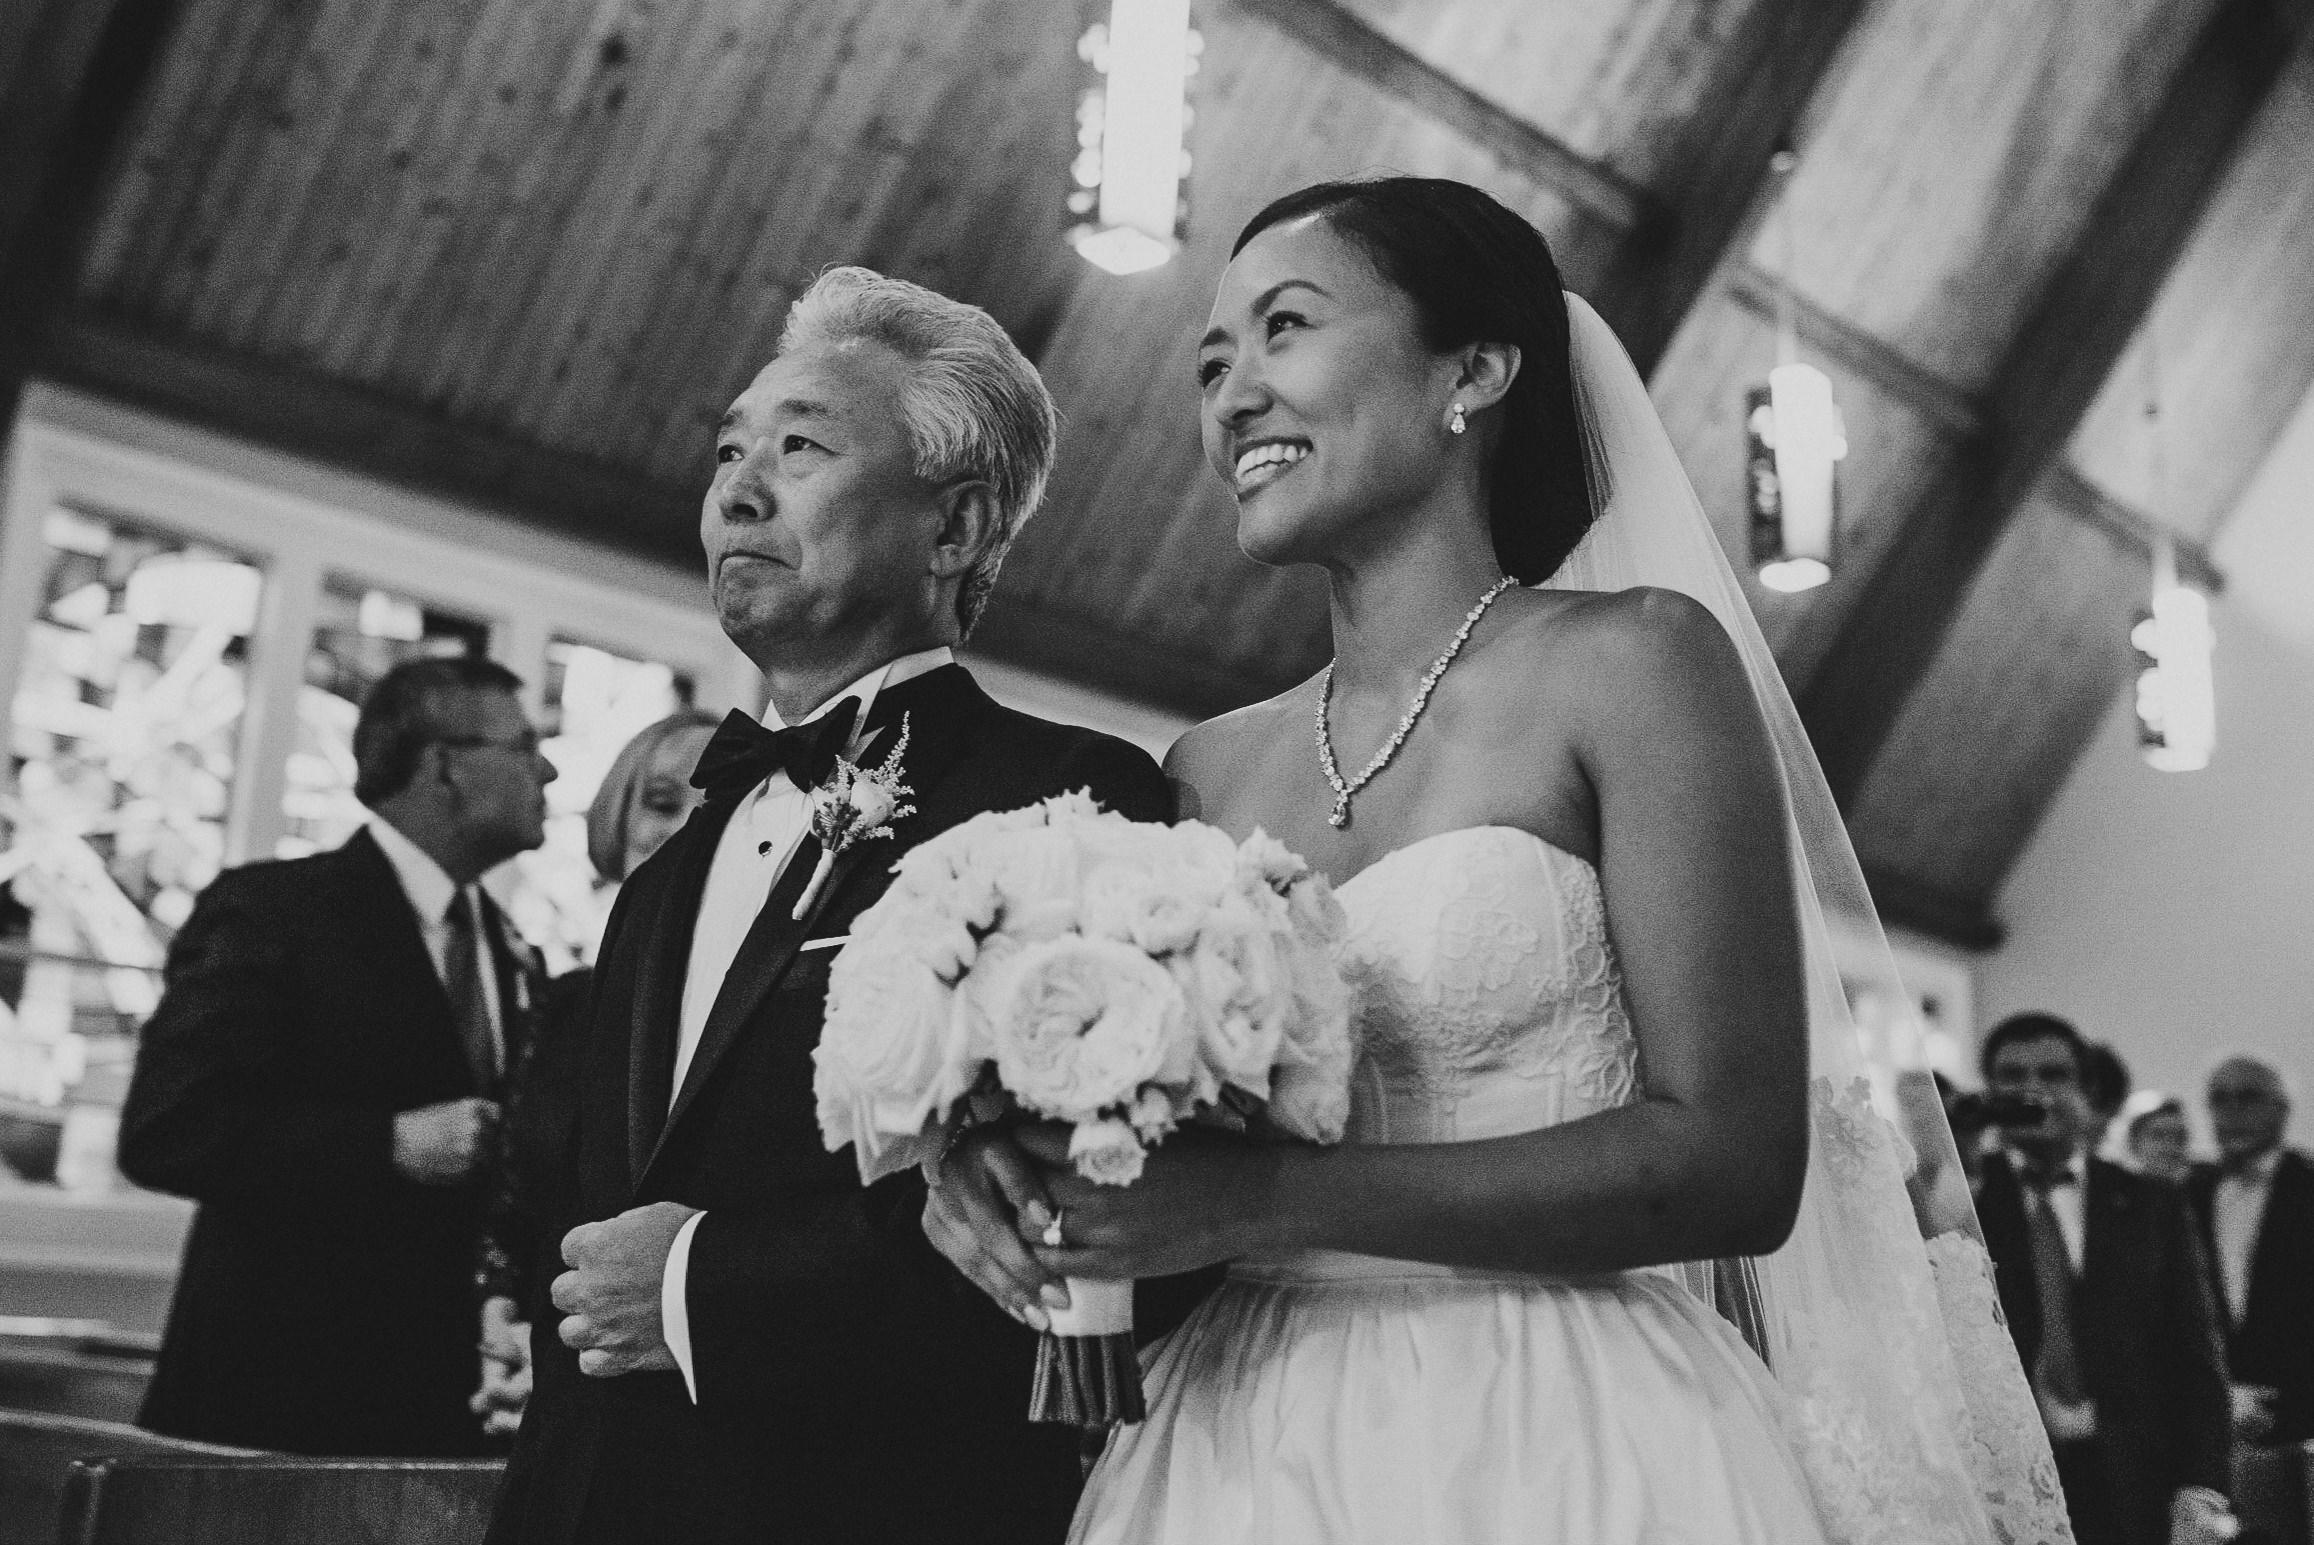 Wedding at Woodlawn Manor Sandy Spring Maryland by Mantas Kubilinskas-10.jpg